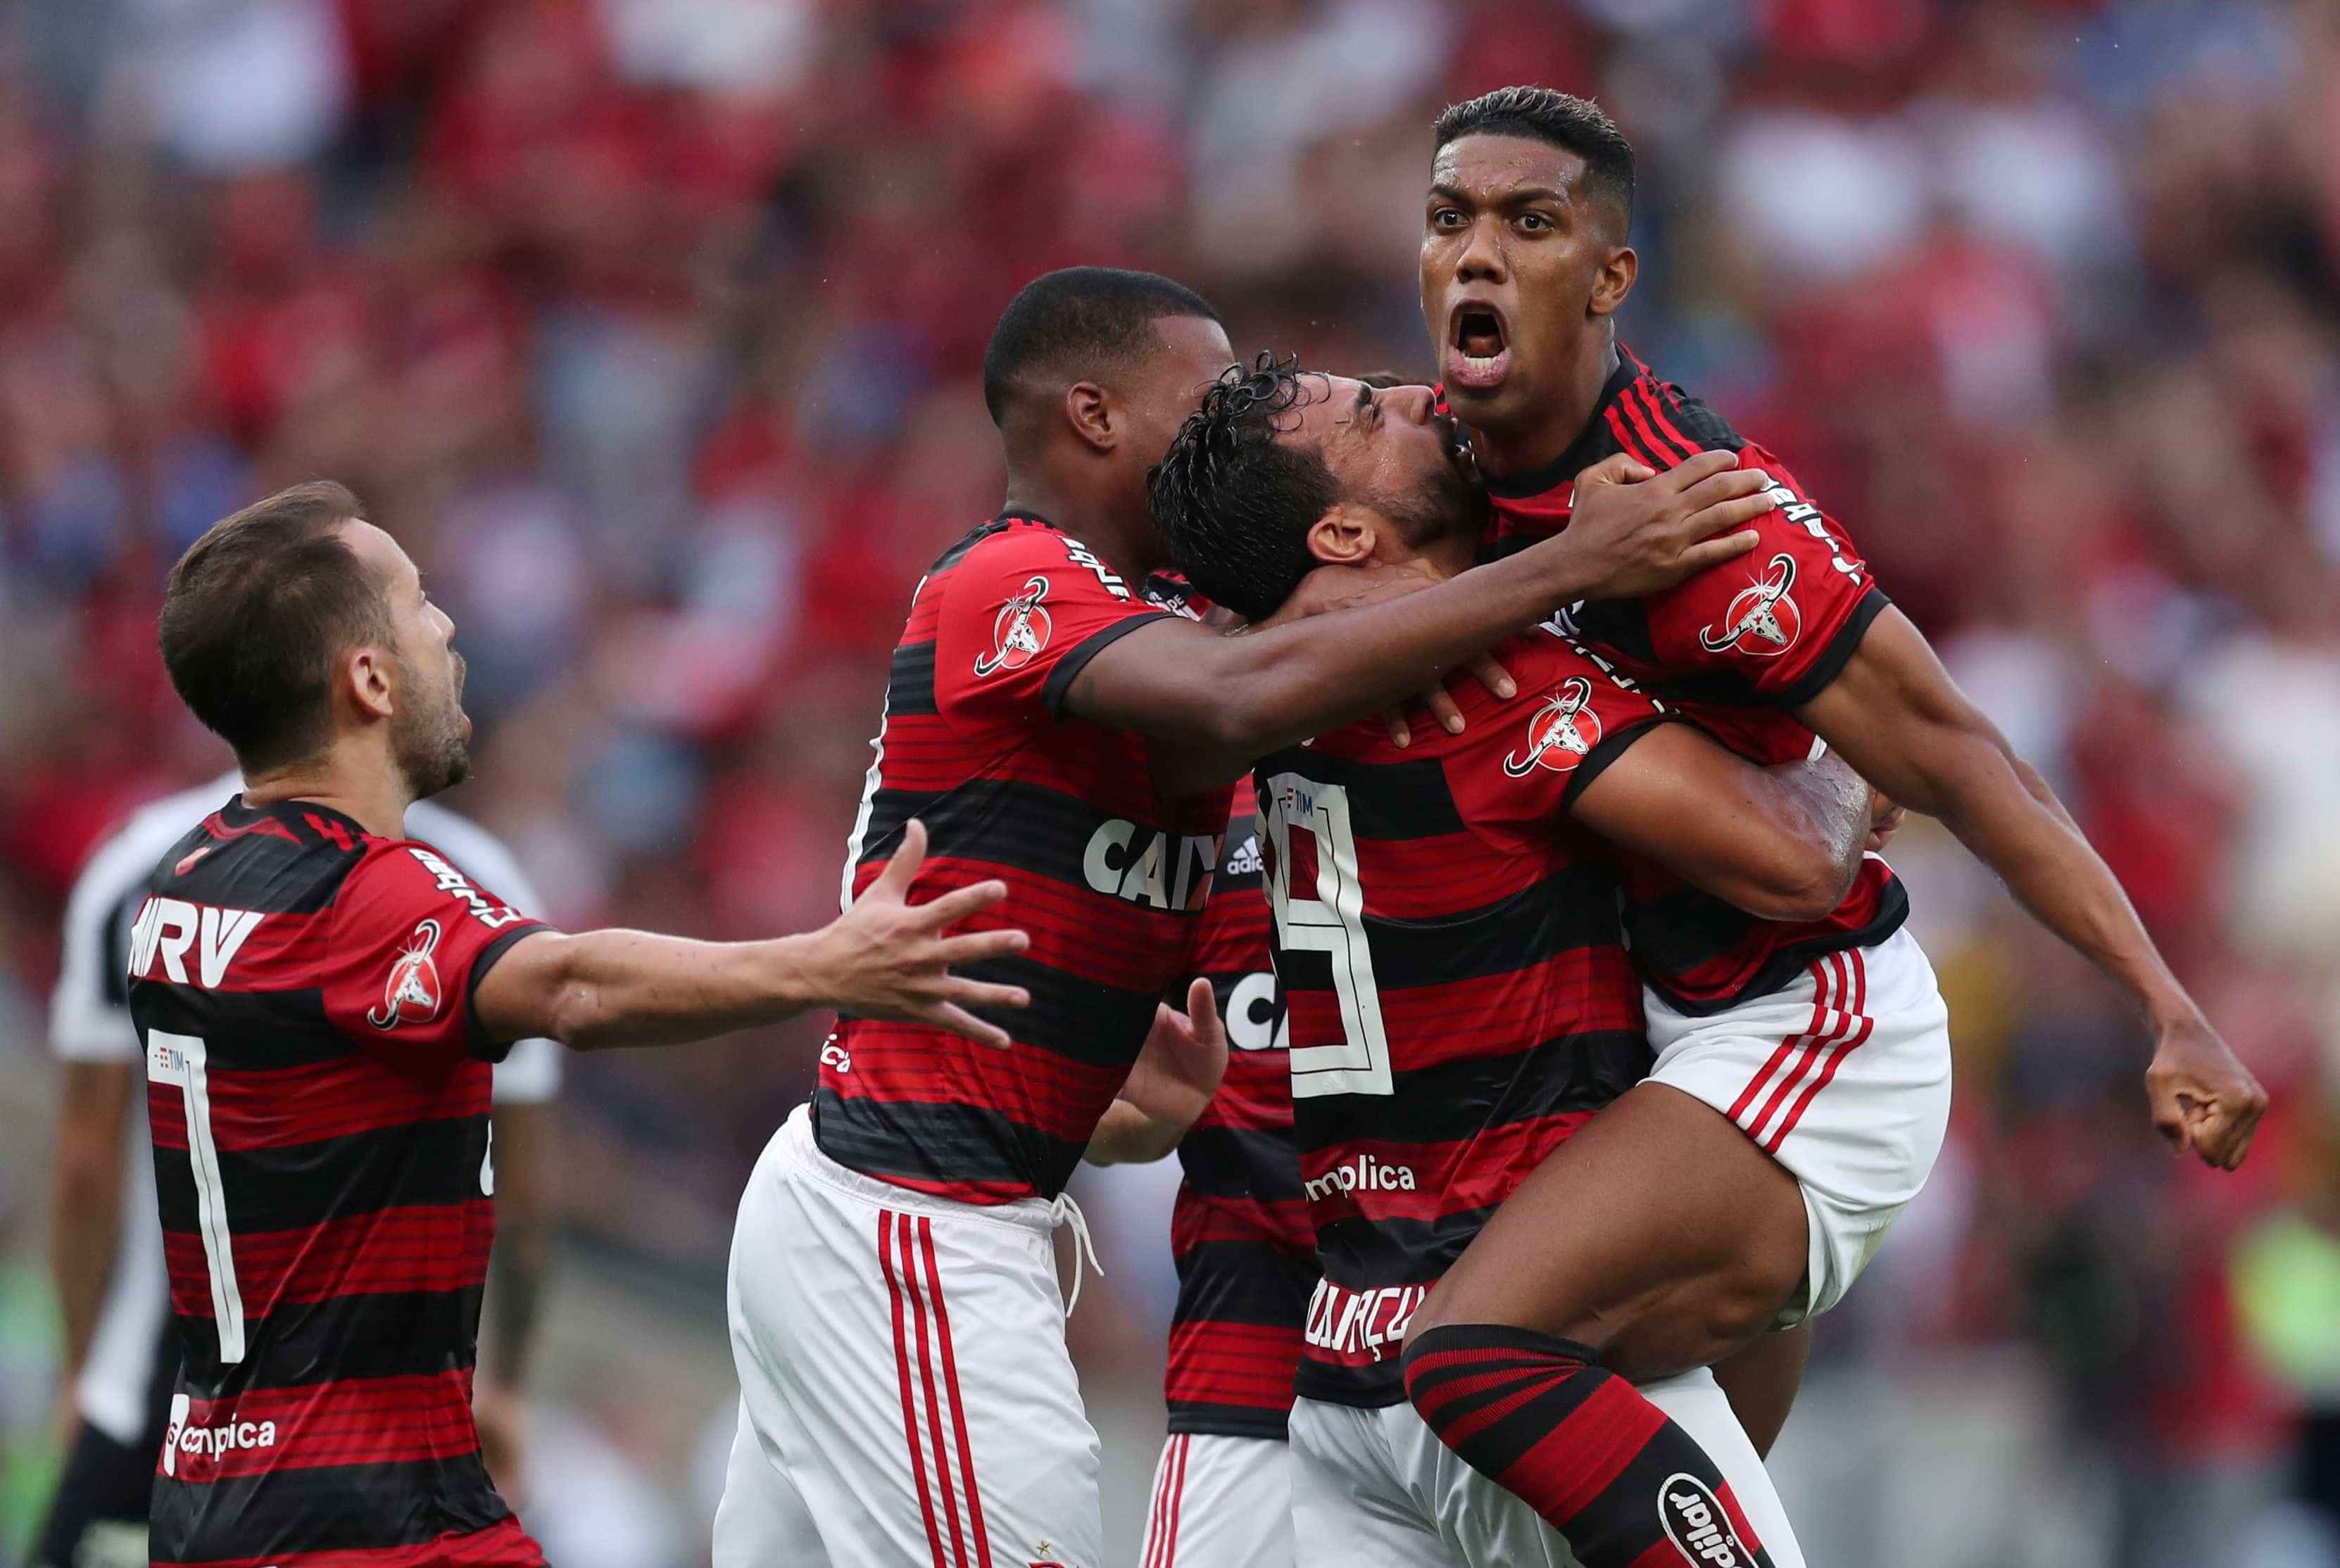 Flamengo recebe o Grêmio por sonho de título